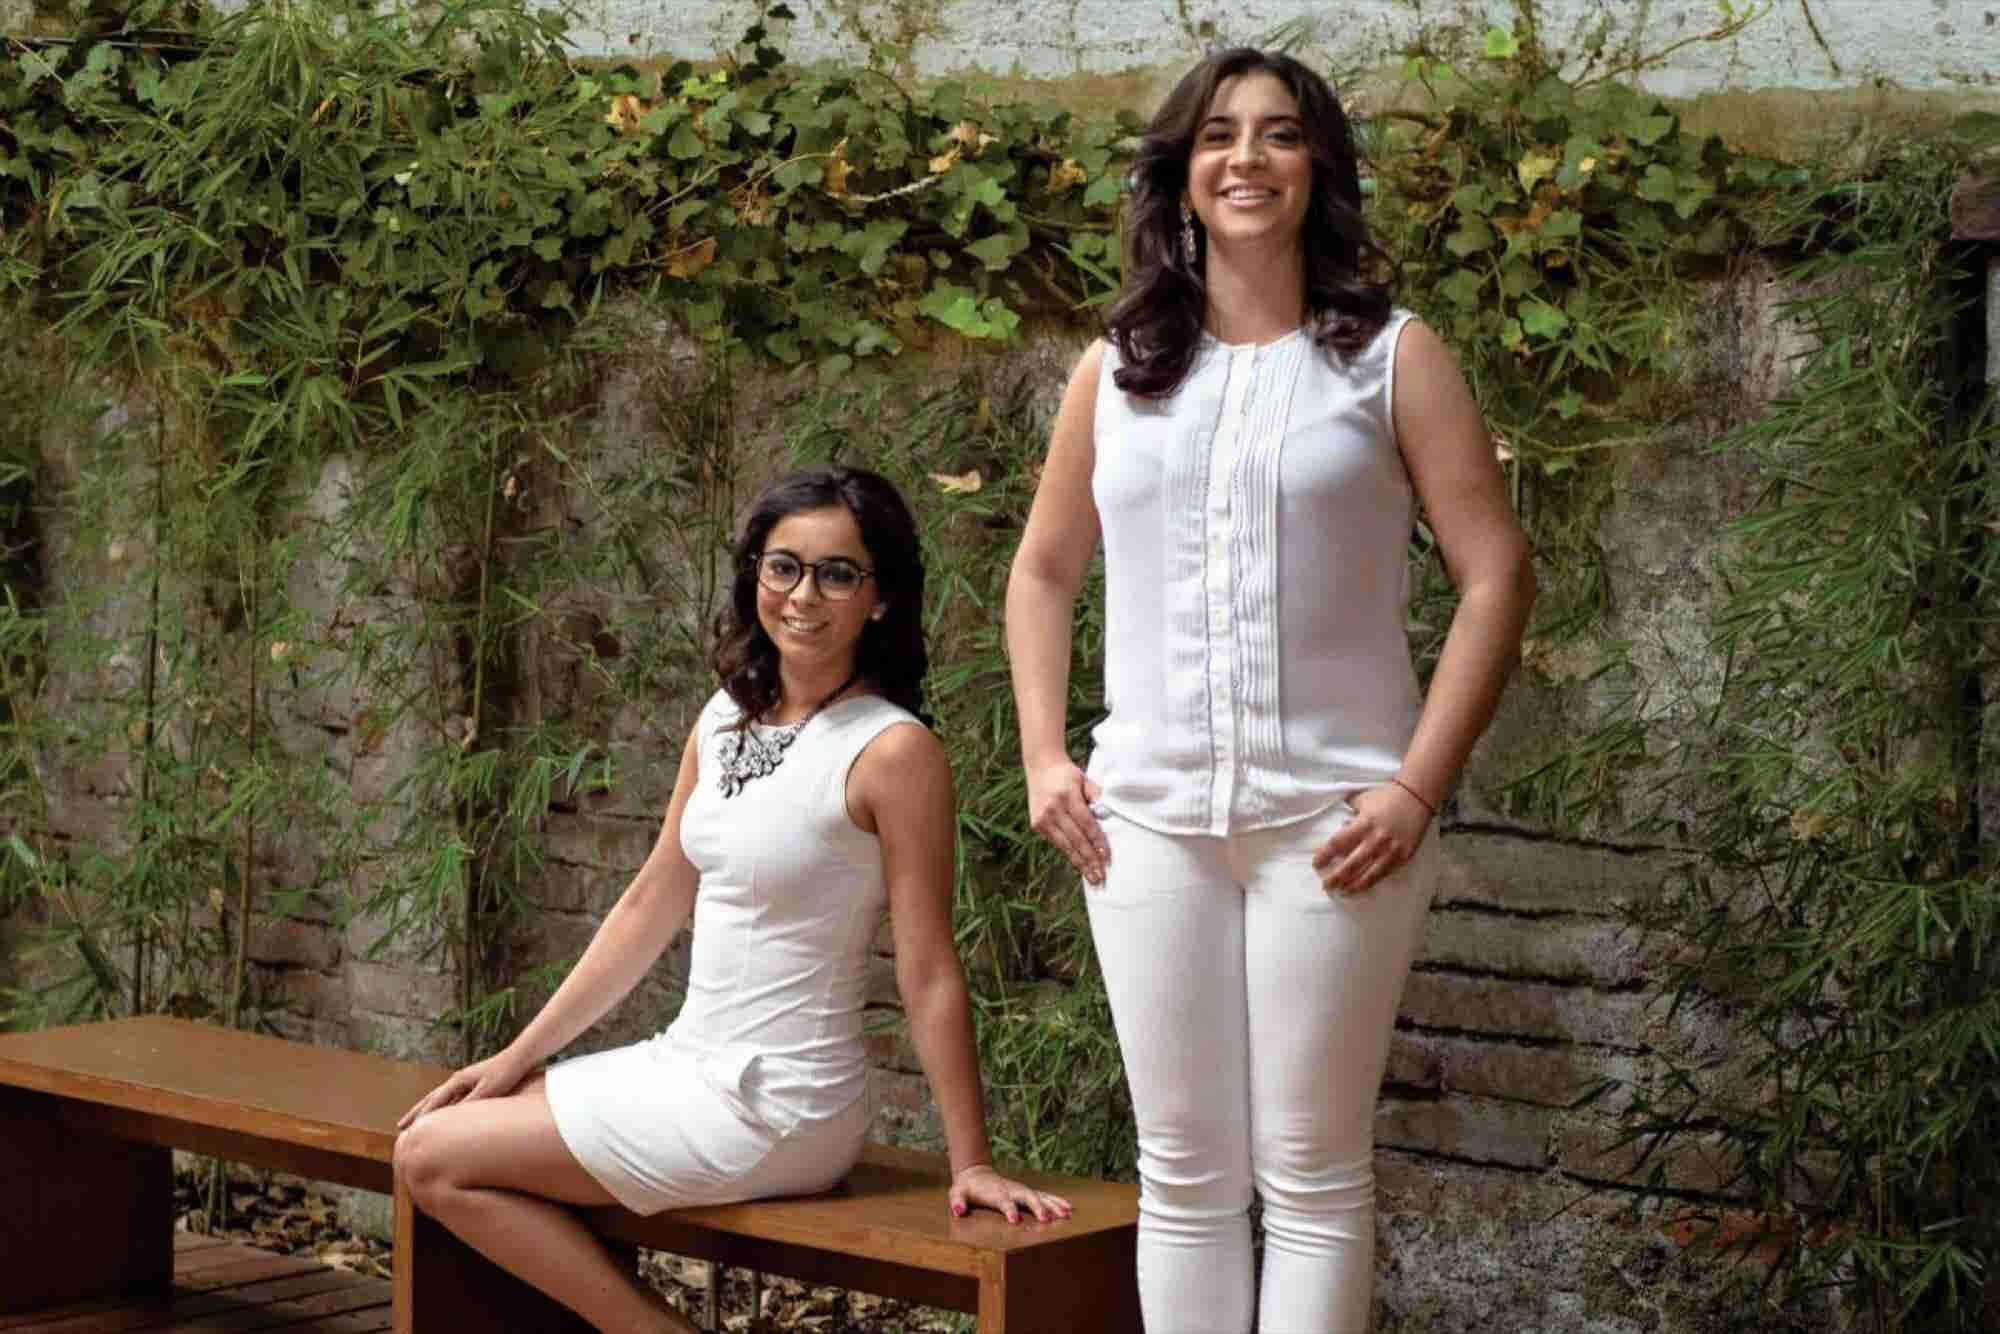 Mujeres que pisan fuerte: Ana Karen Ramírez y Daniela González